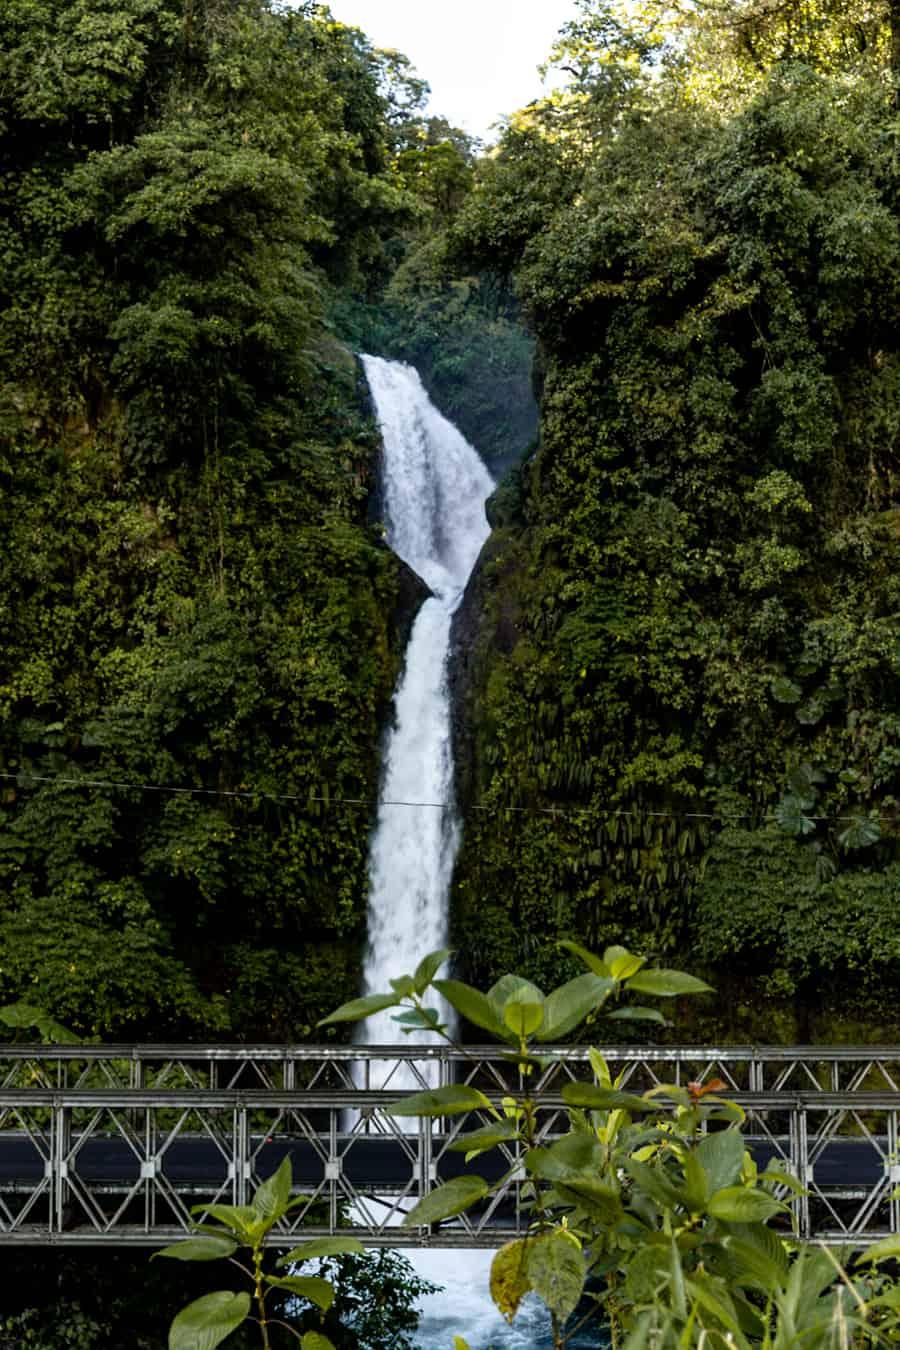 Costa Rica Travel Guide - Waterfall and bridge in Costa Rica